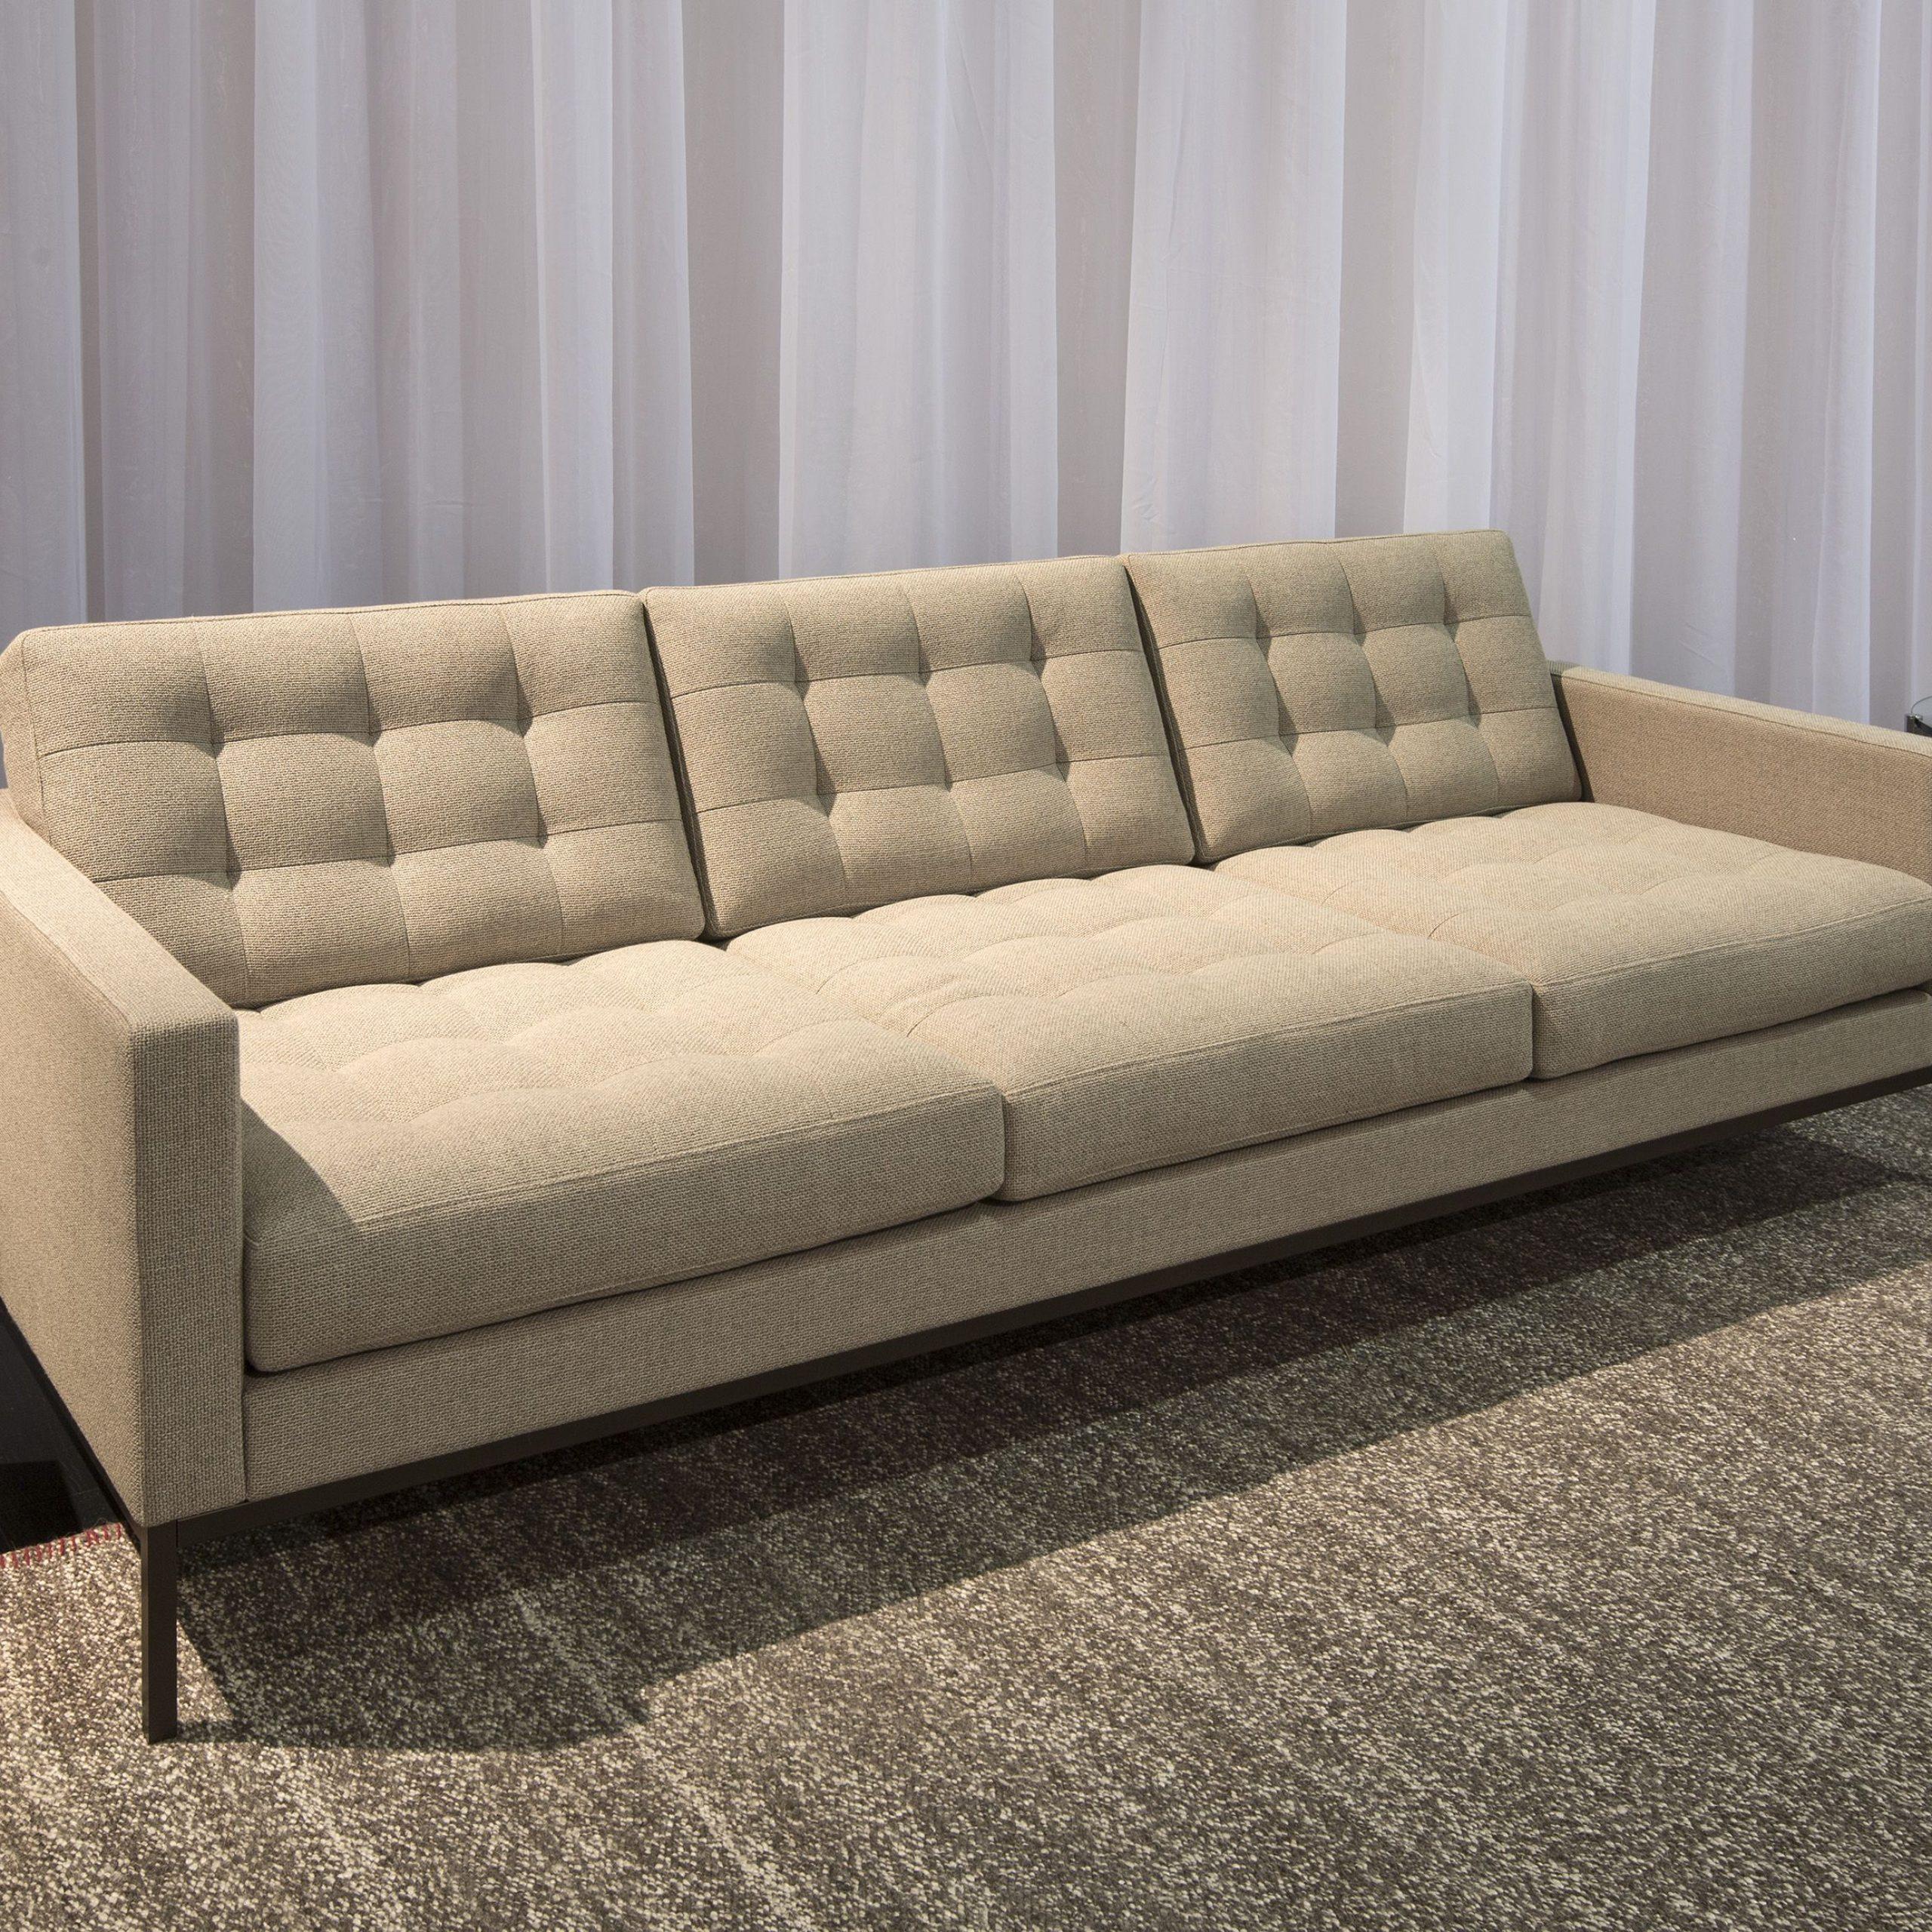 Florence Knoll Sofa, Salone 2014. Photoa (View 1 of 15)